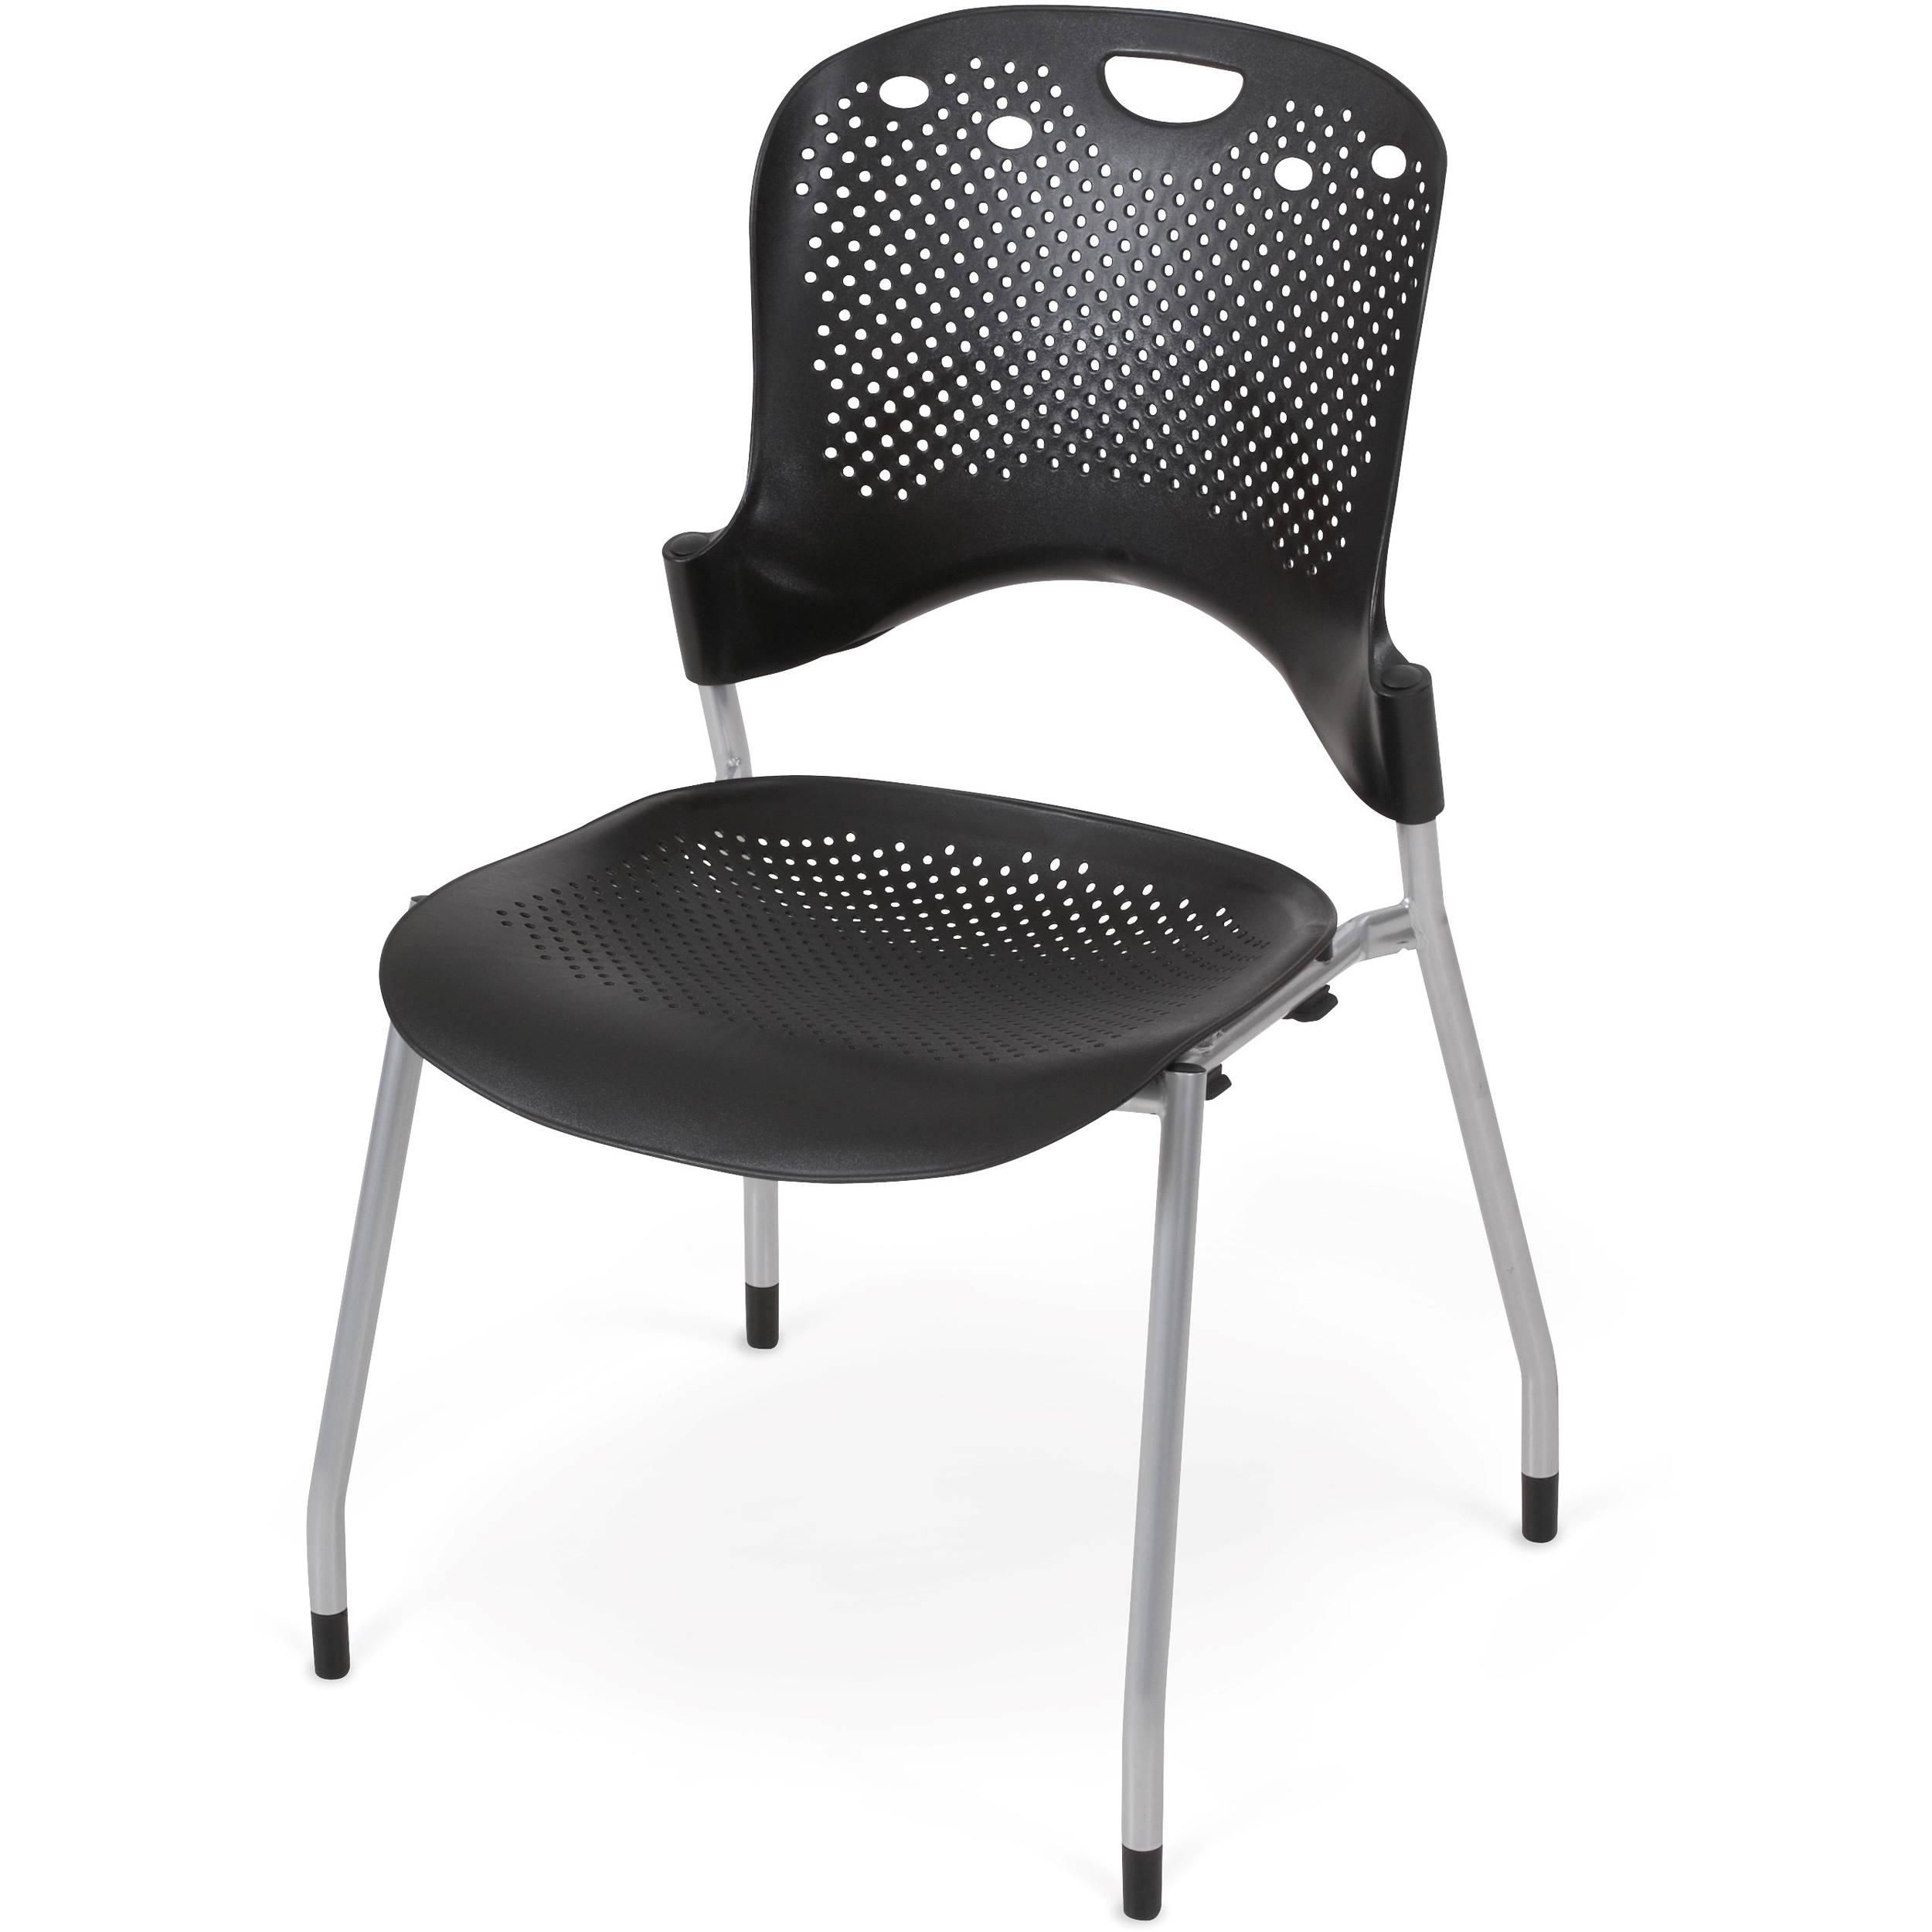 Balt Circulation Stacking Chair 2 Pack